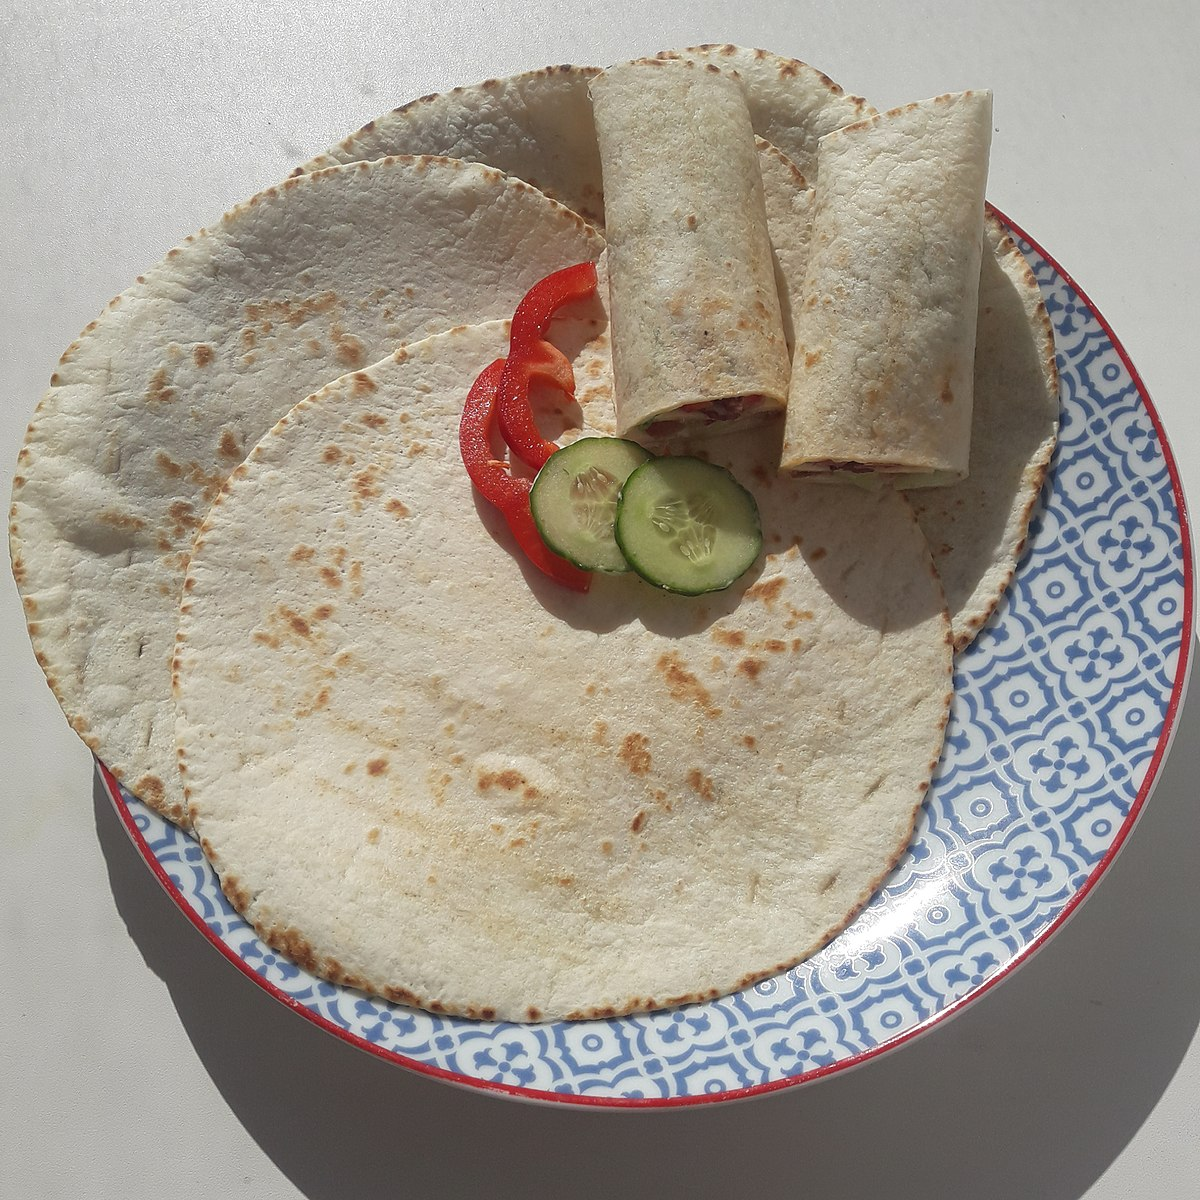 Юха (хлеб) — Википедия